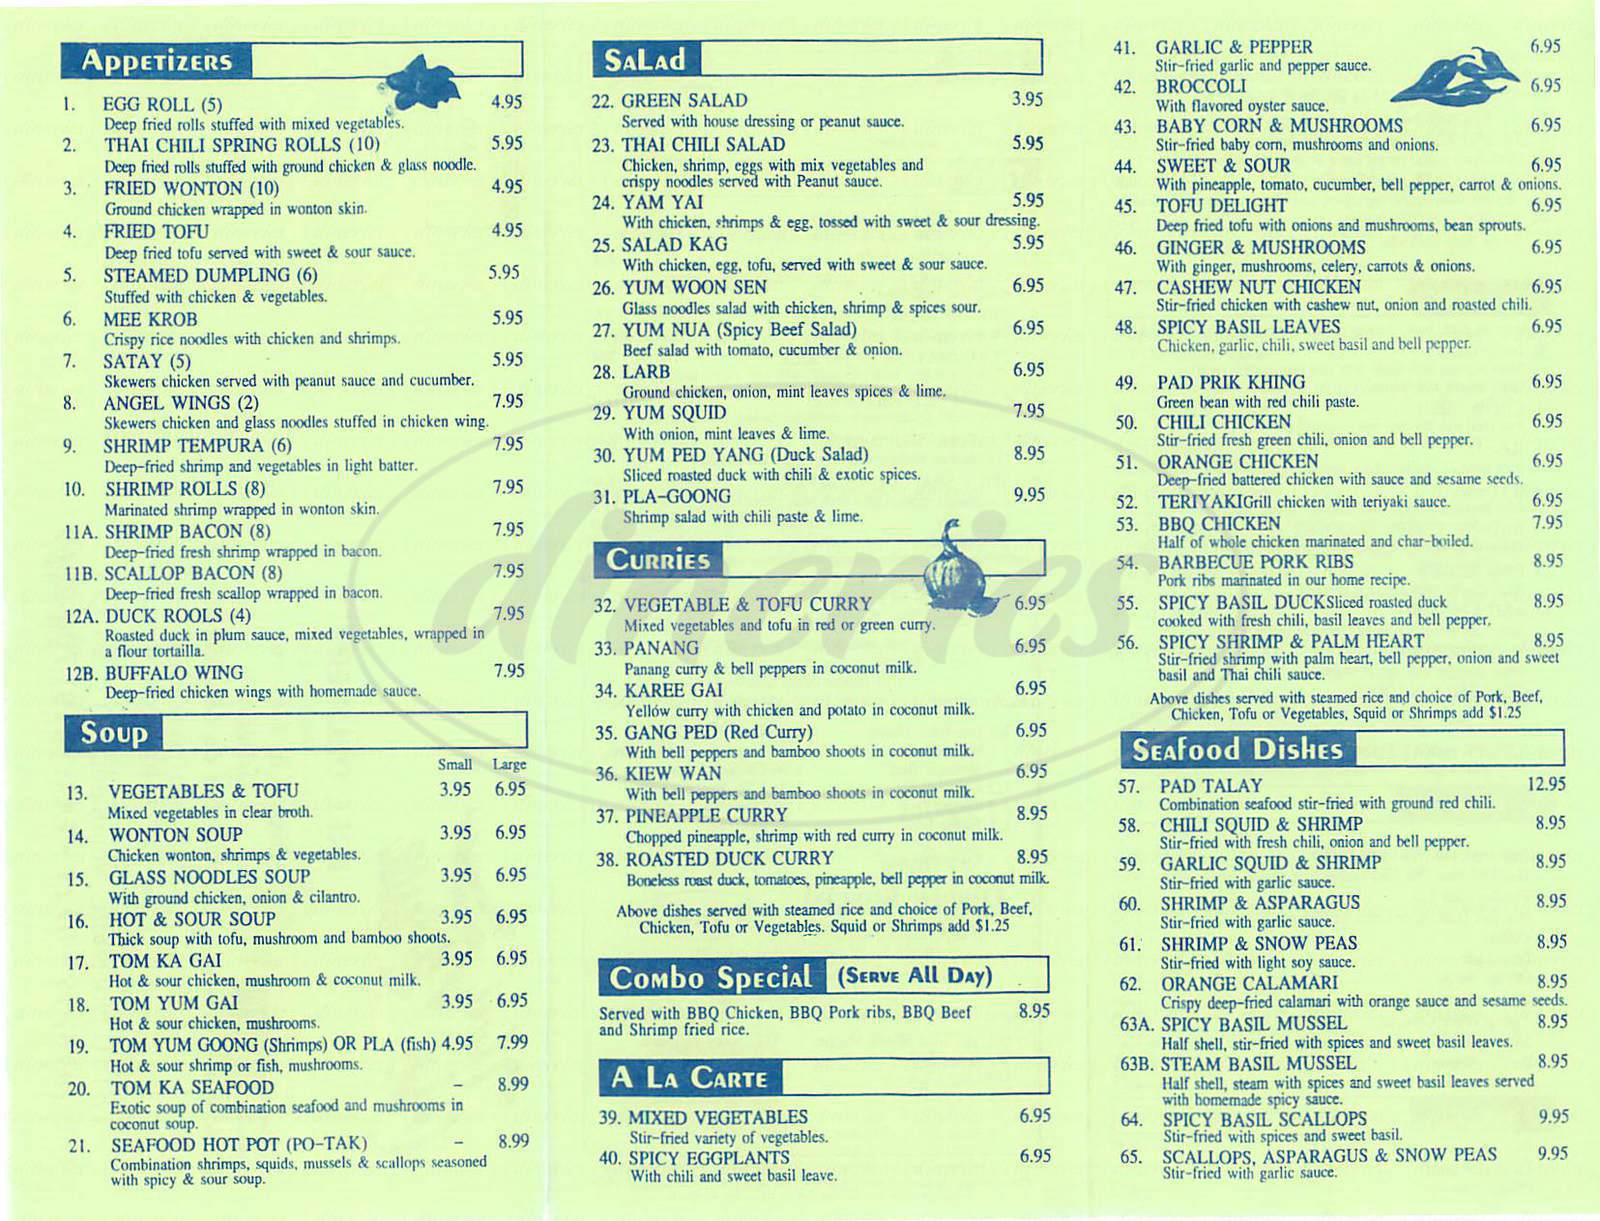 menu for Thai Chili House